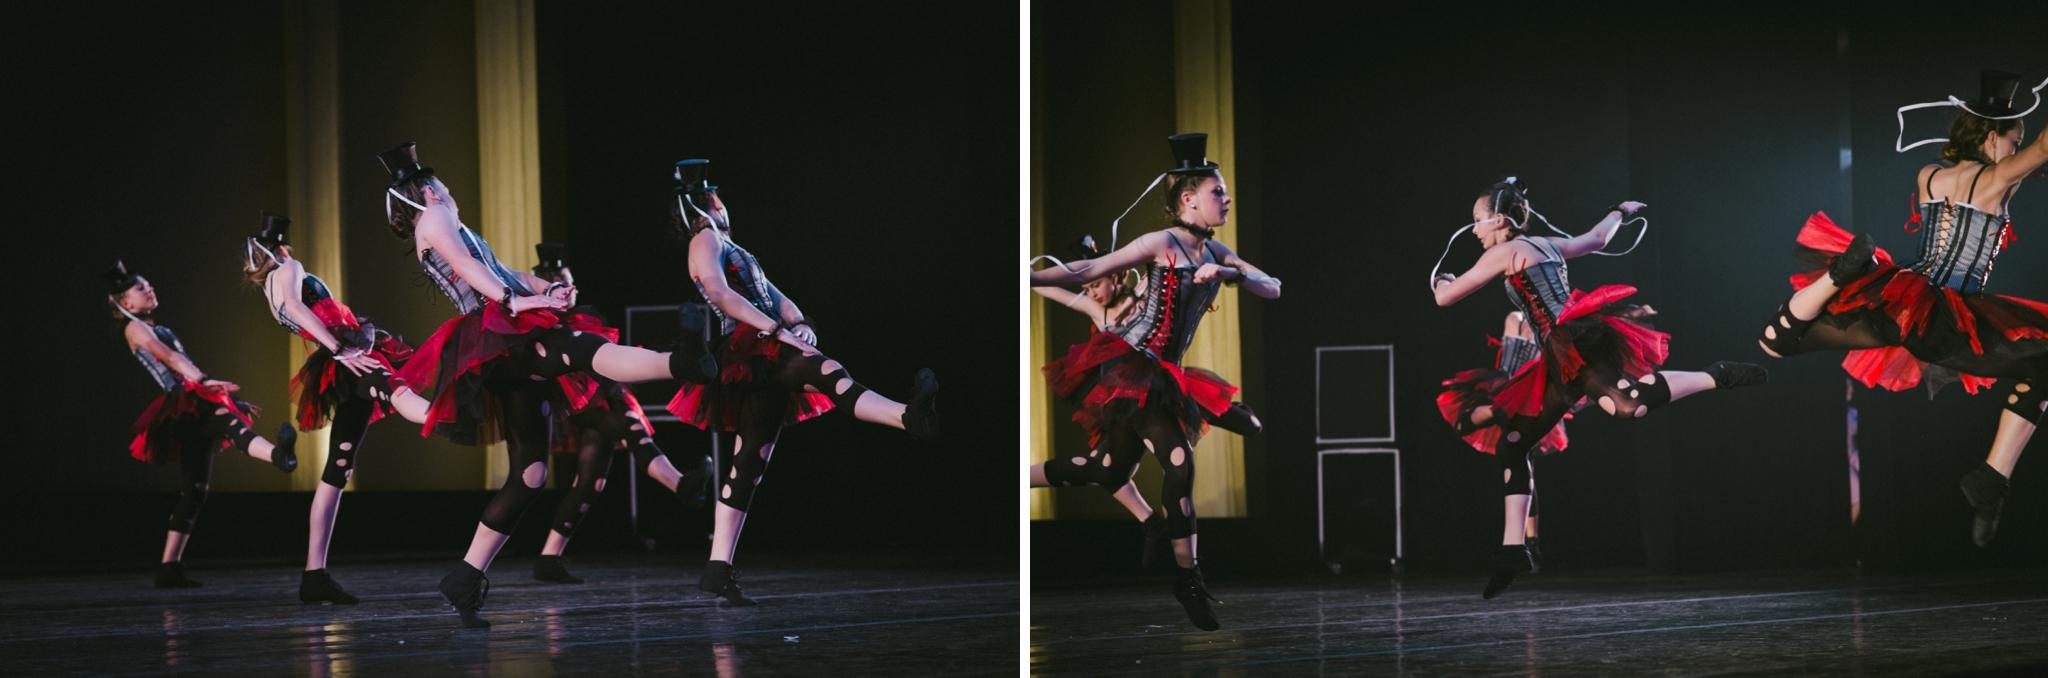 32-action-shots-dancers-bdc-rehearsals.jpg